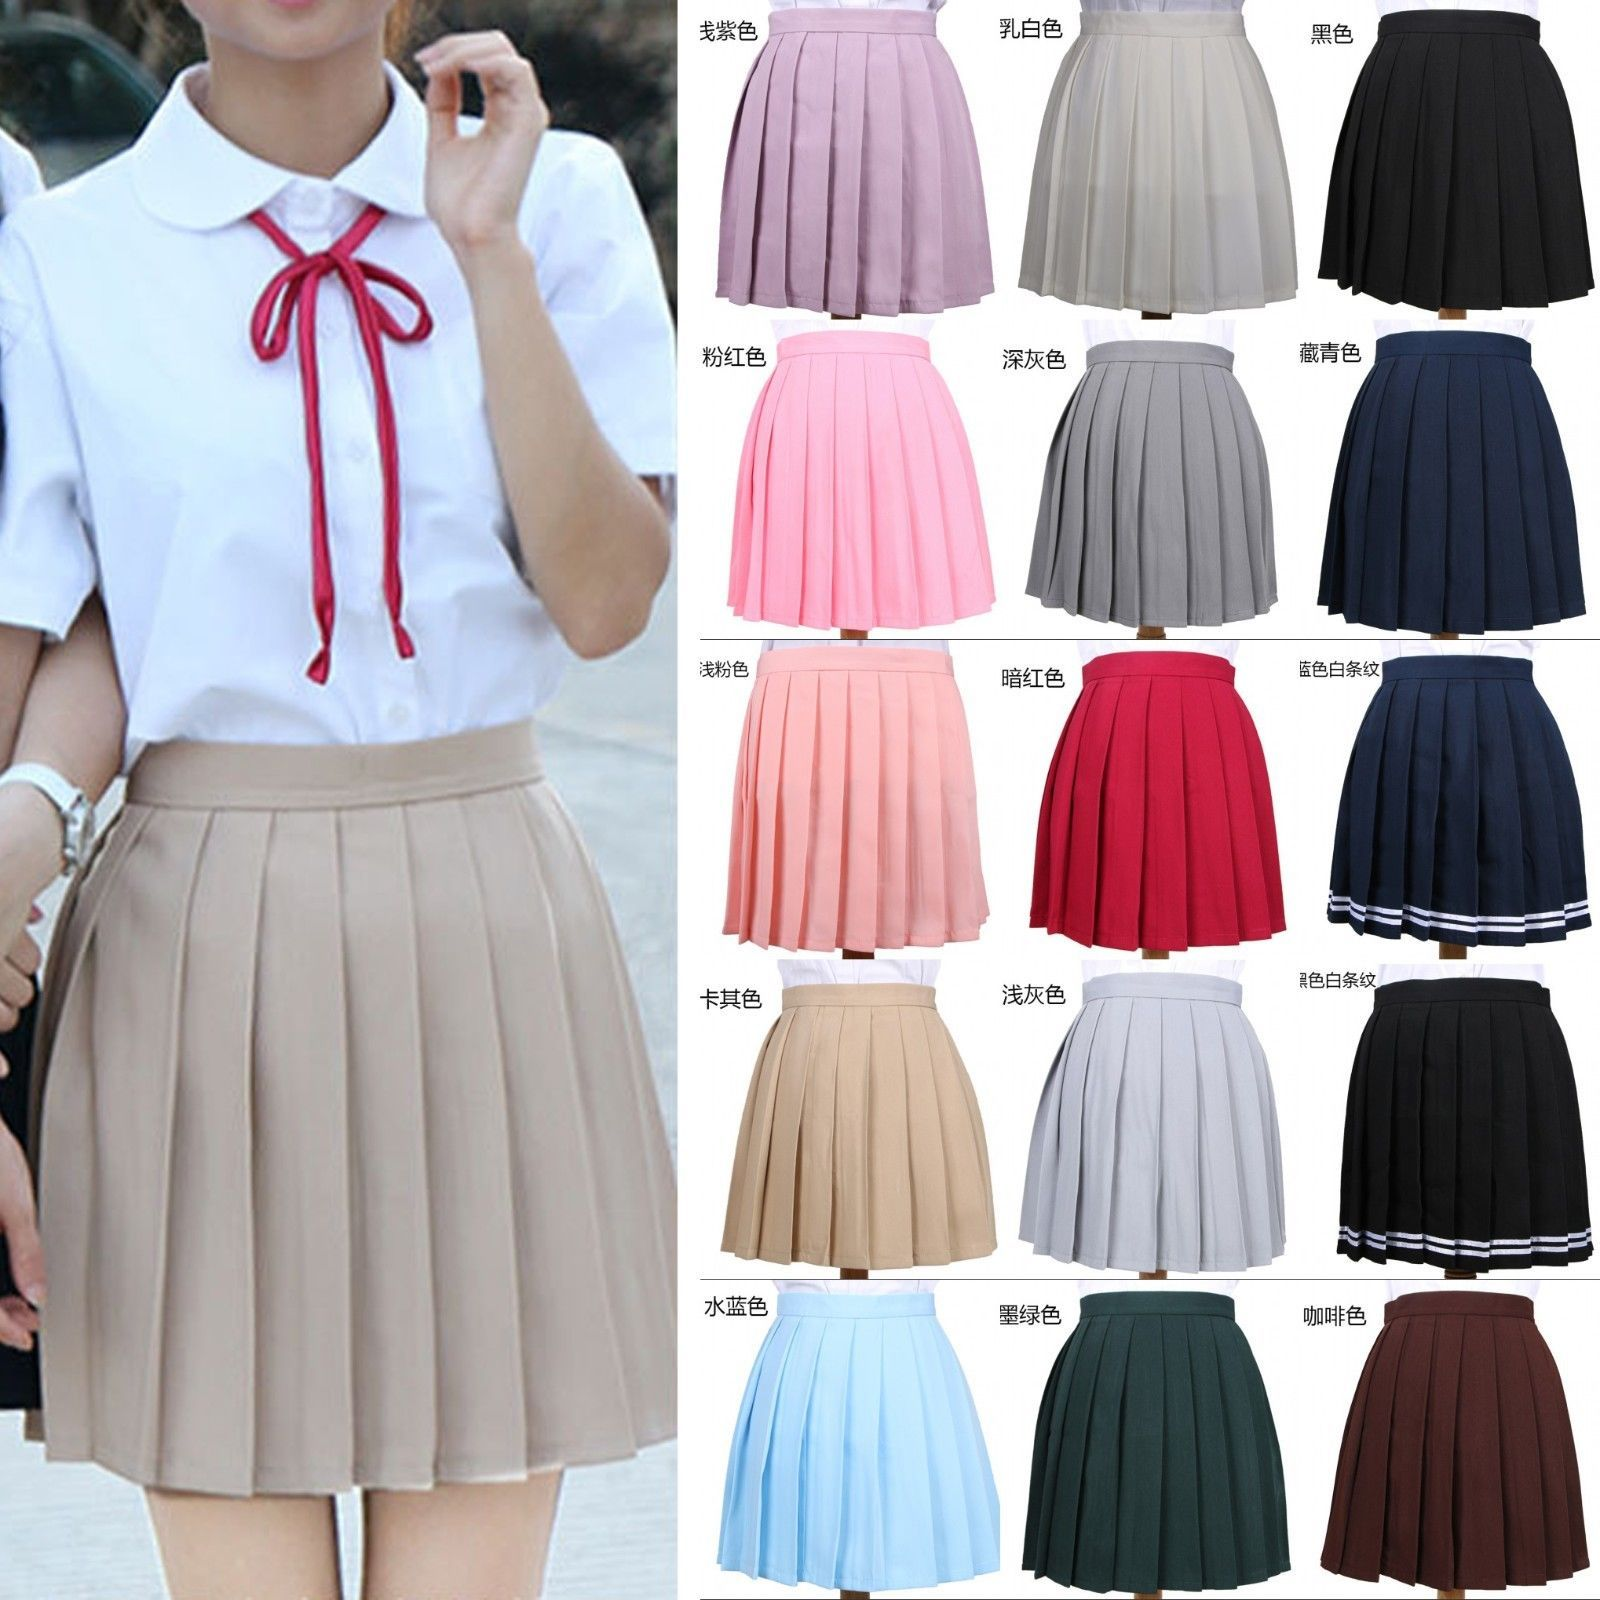 07a4ff7da Girl High Waist Pleated Skirt Anime Cosplay School Uniform Jk Student Mini  Skirt